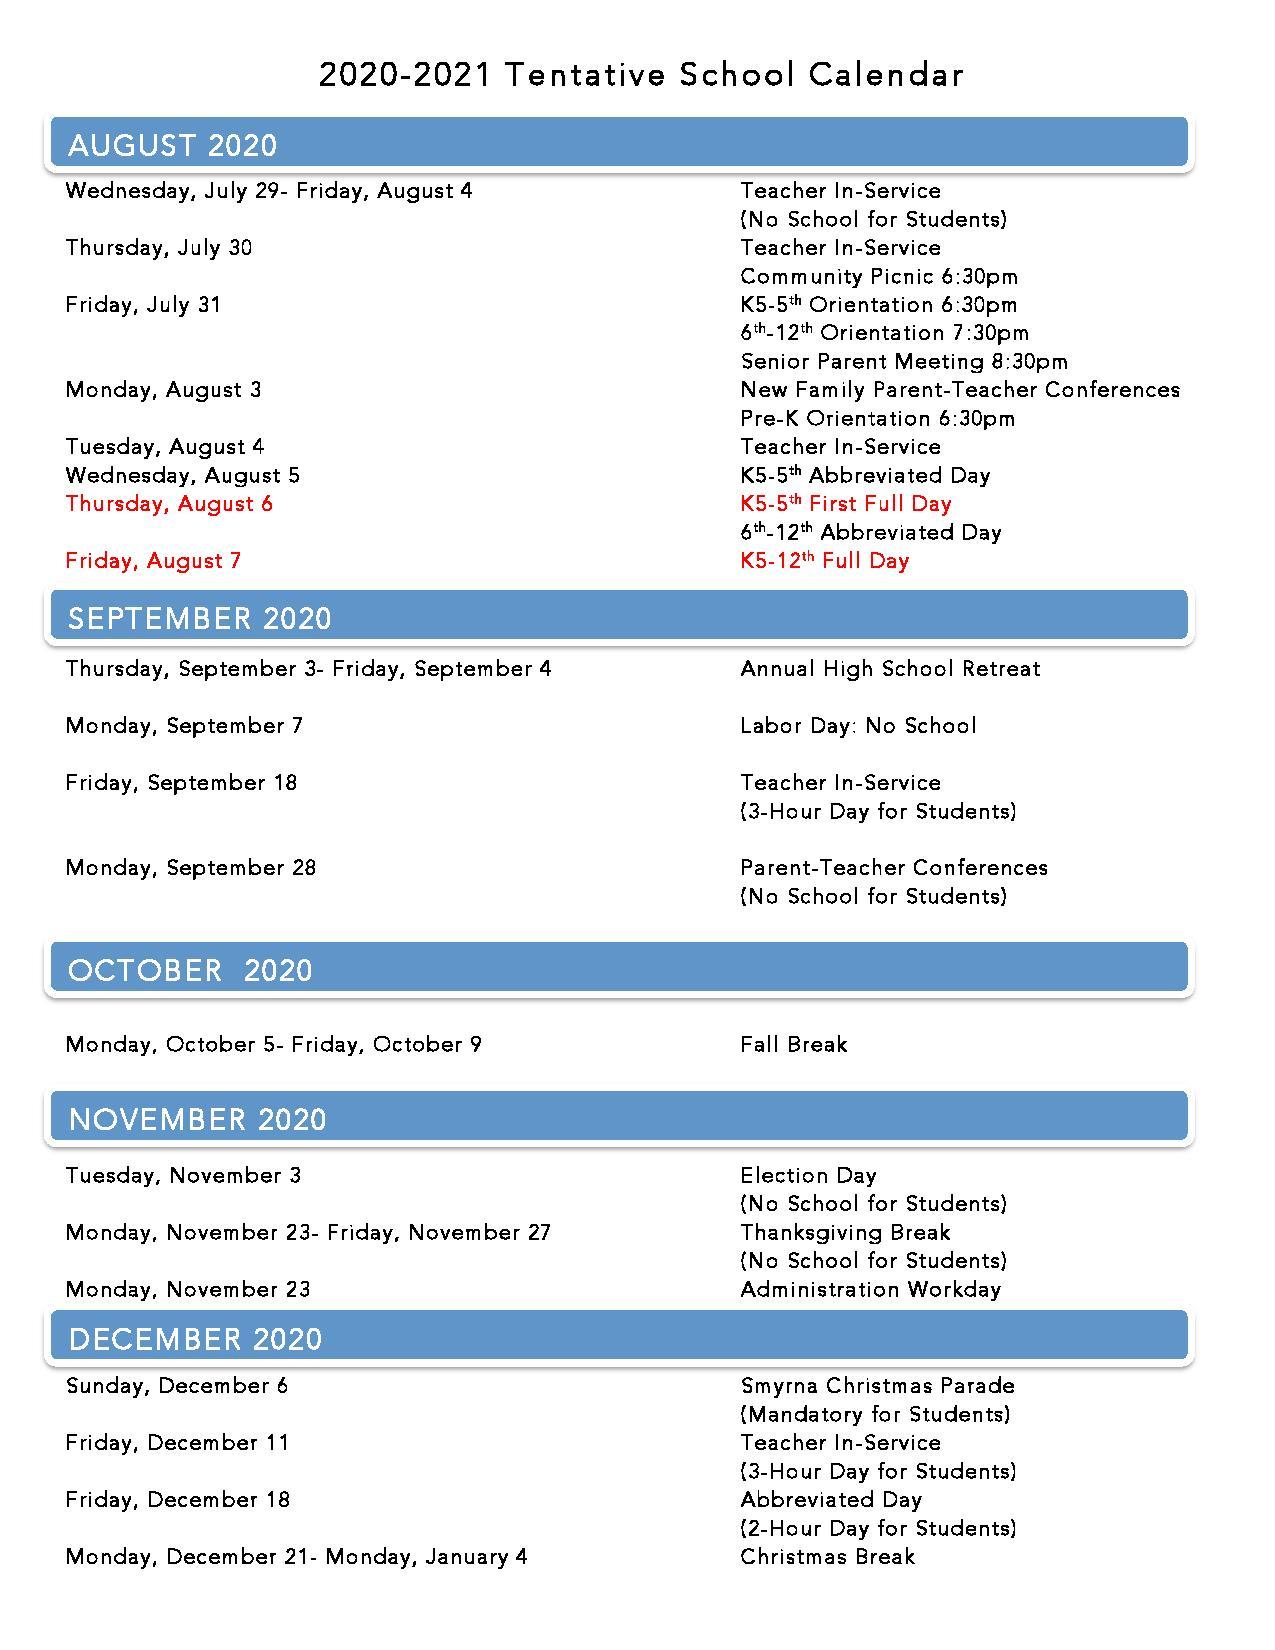 Lca Calendar With Davidson County Tn School 2021 - 2020 Calendar